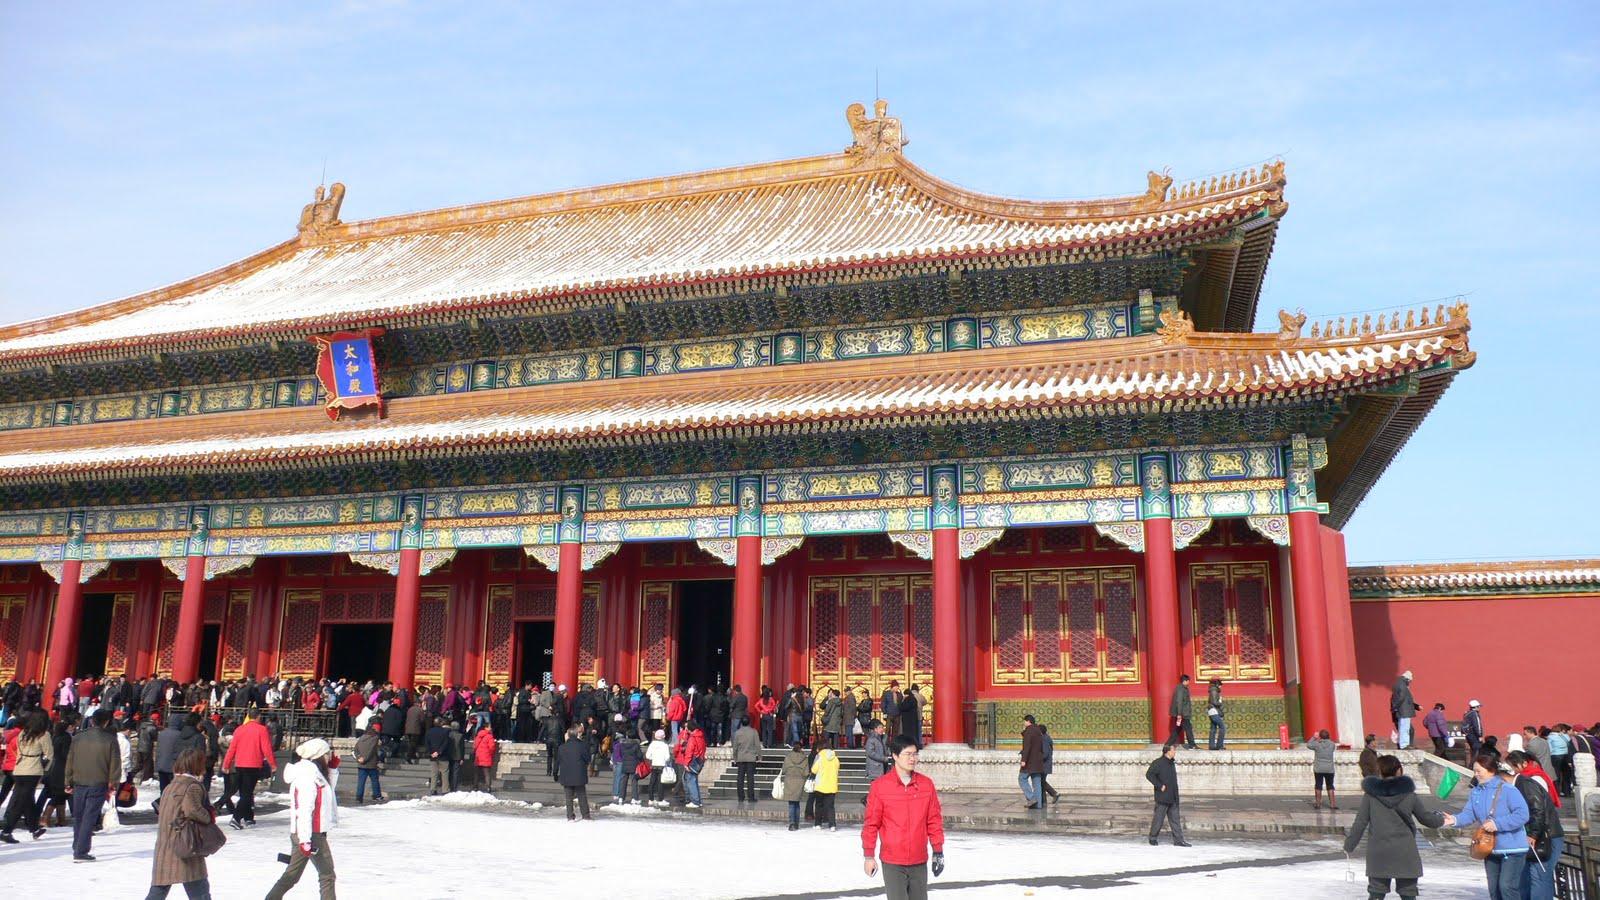 Historia del arte gabriela vernet arquitectura china templos for Tipos de arte arquitectonico